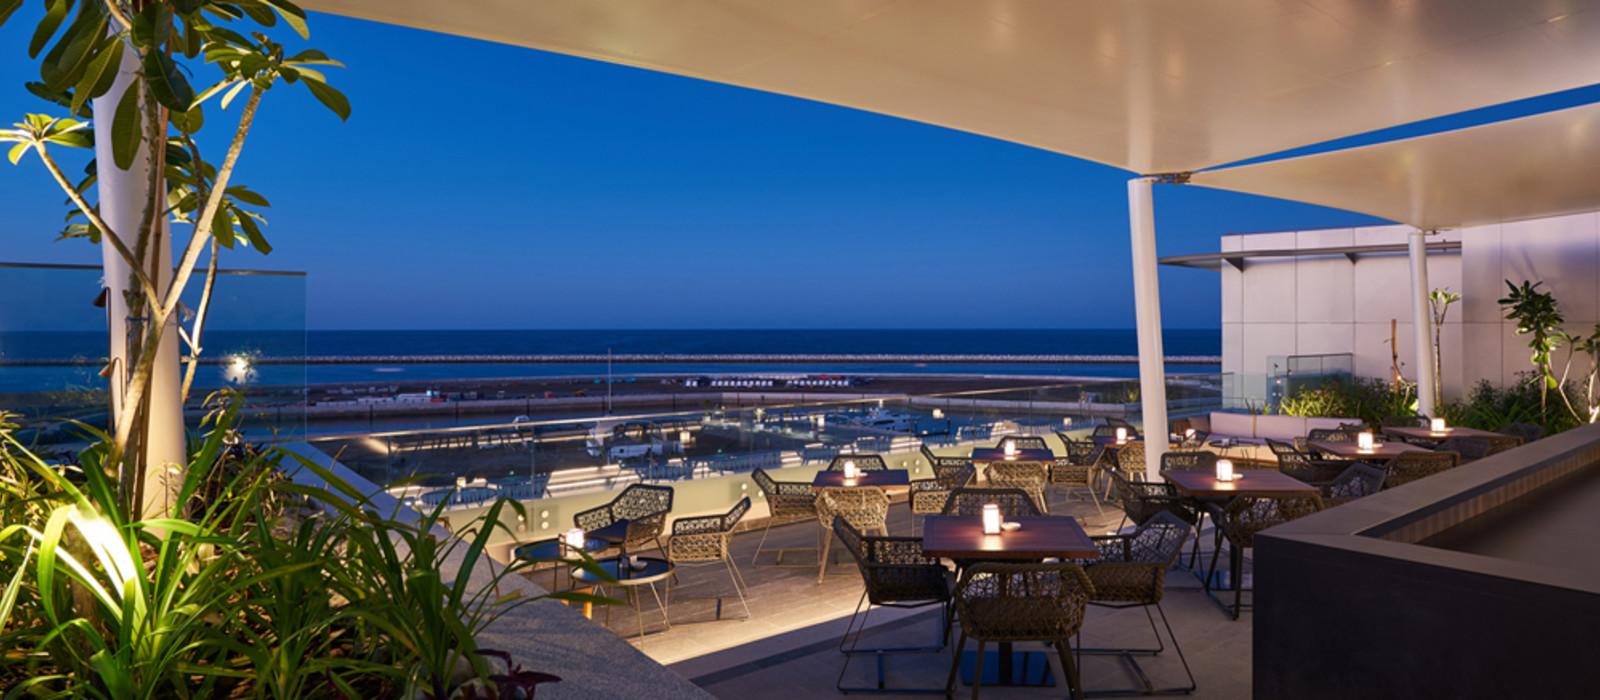 Hotel Mysk Al Mouj by Shaza